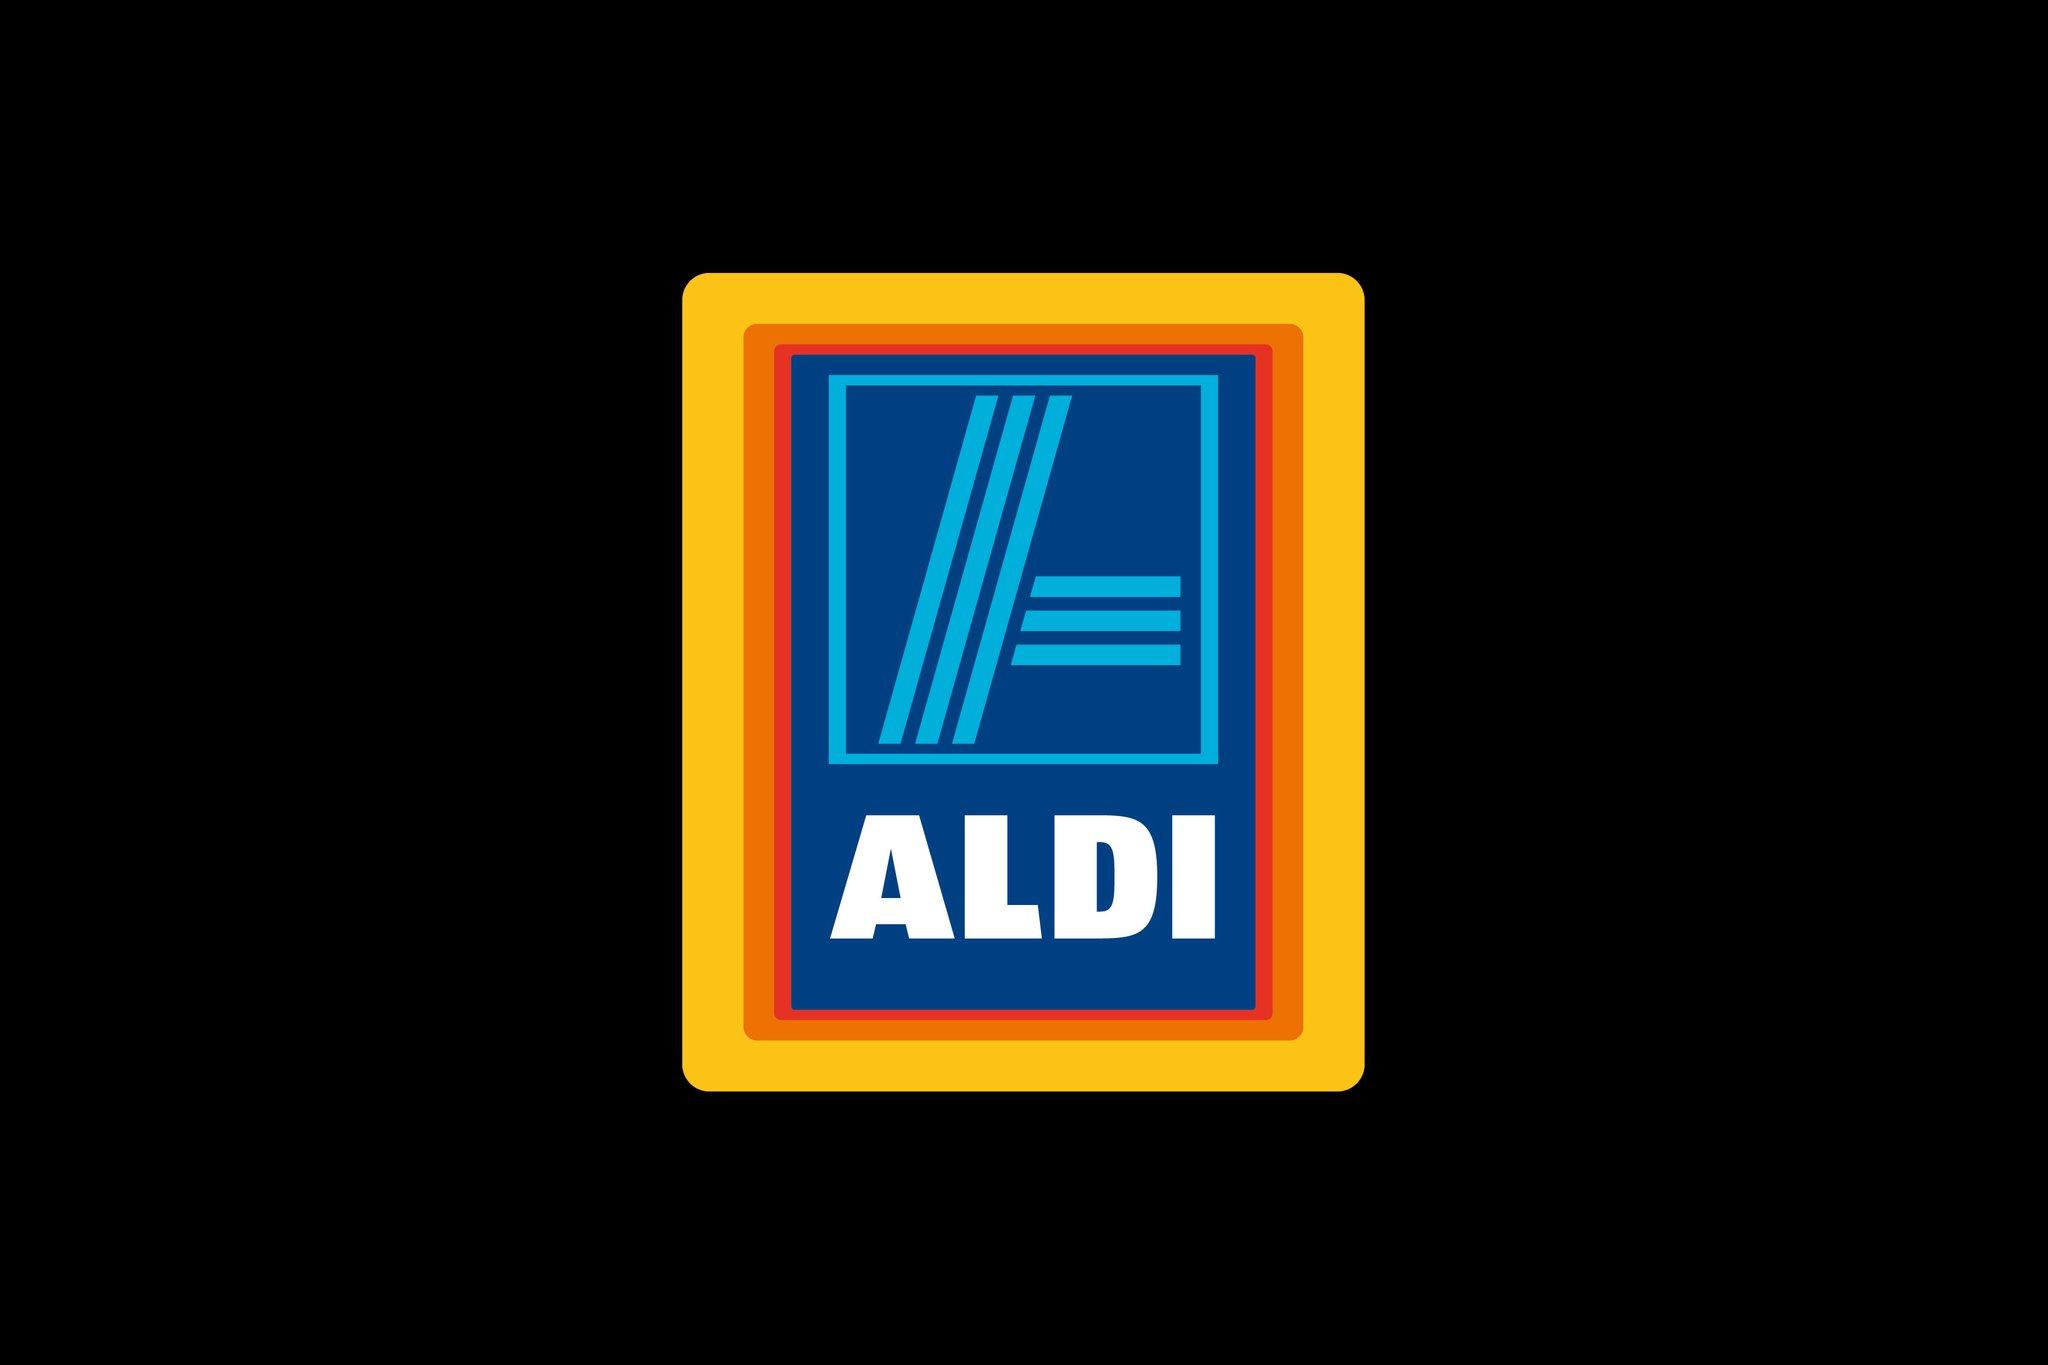 Aldi Denies Plans for eCommerce Service